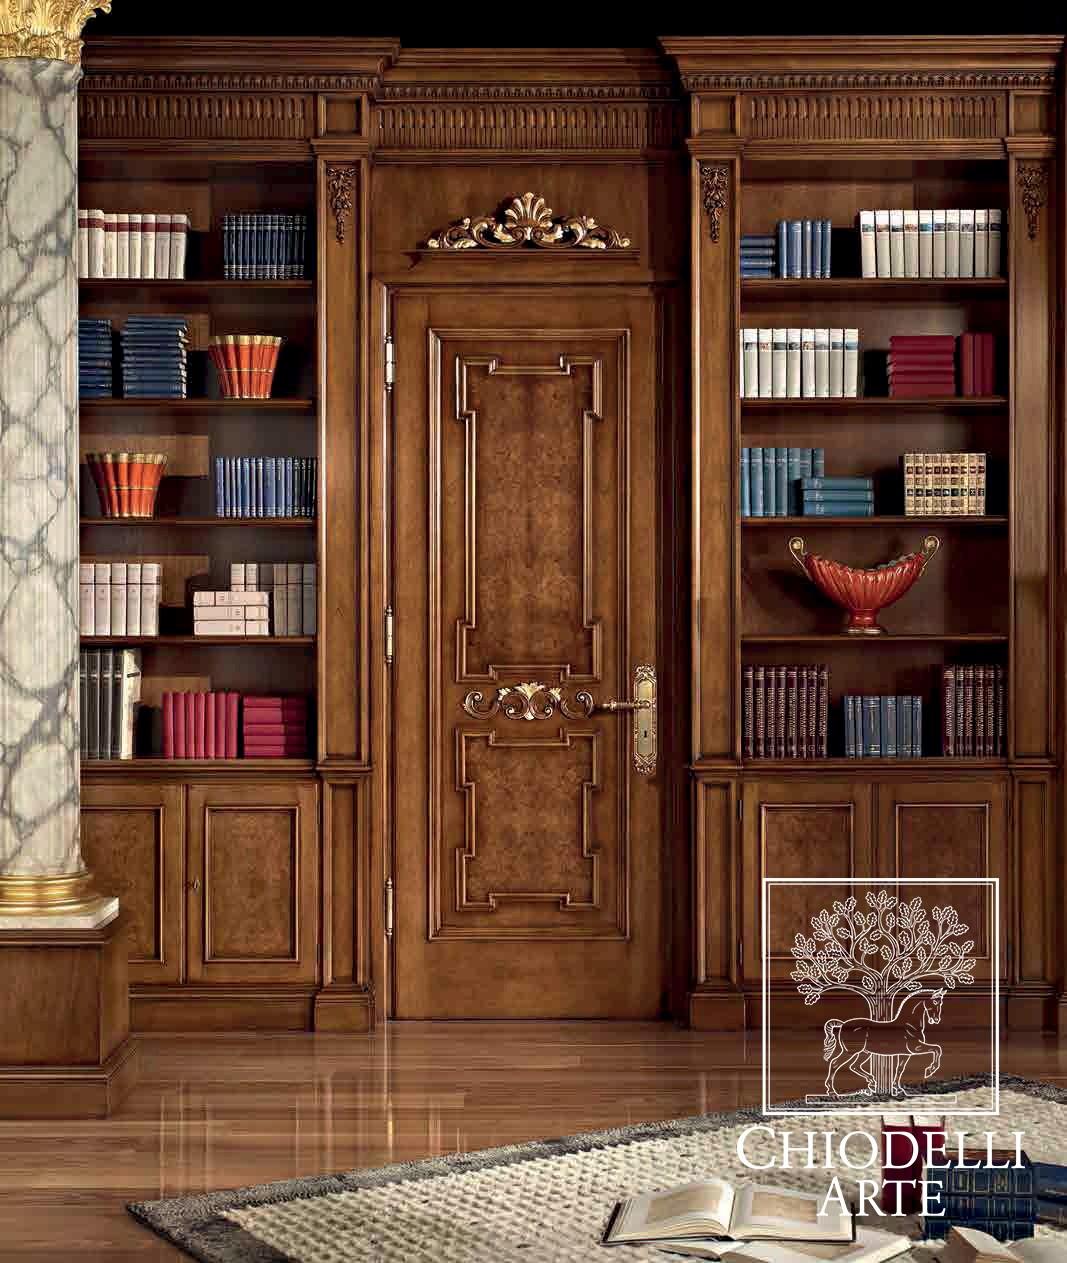 Among valuable materials and fine inlays - طراحی داخلی